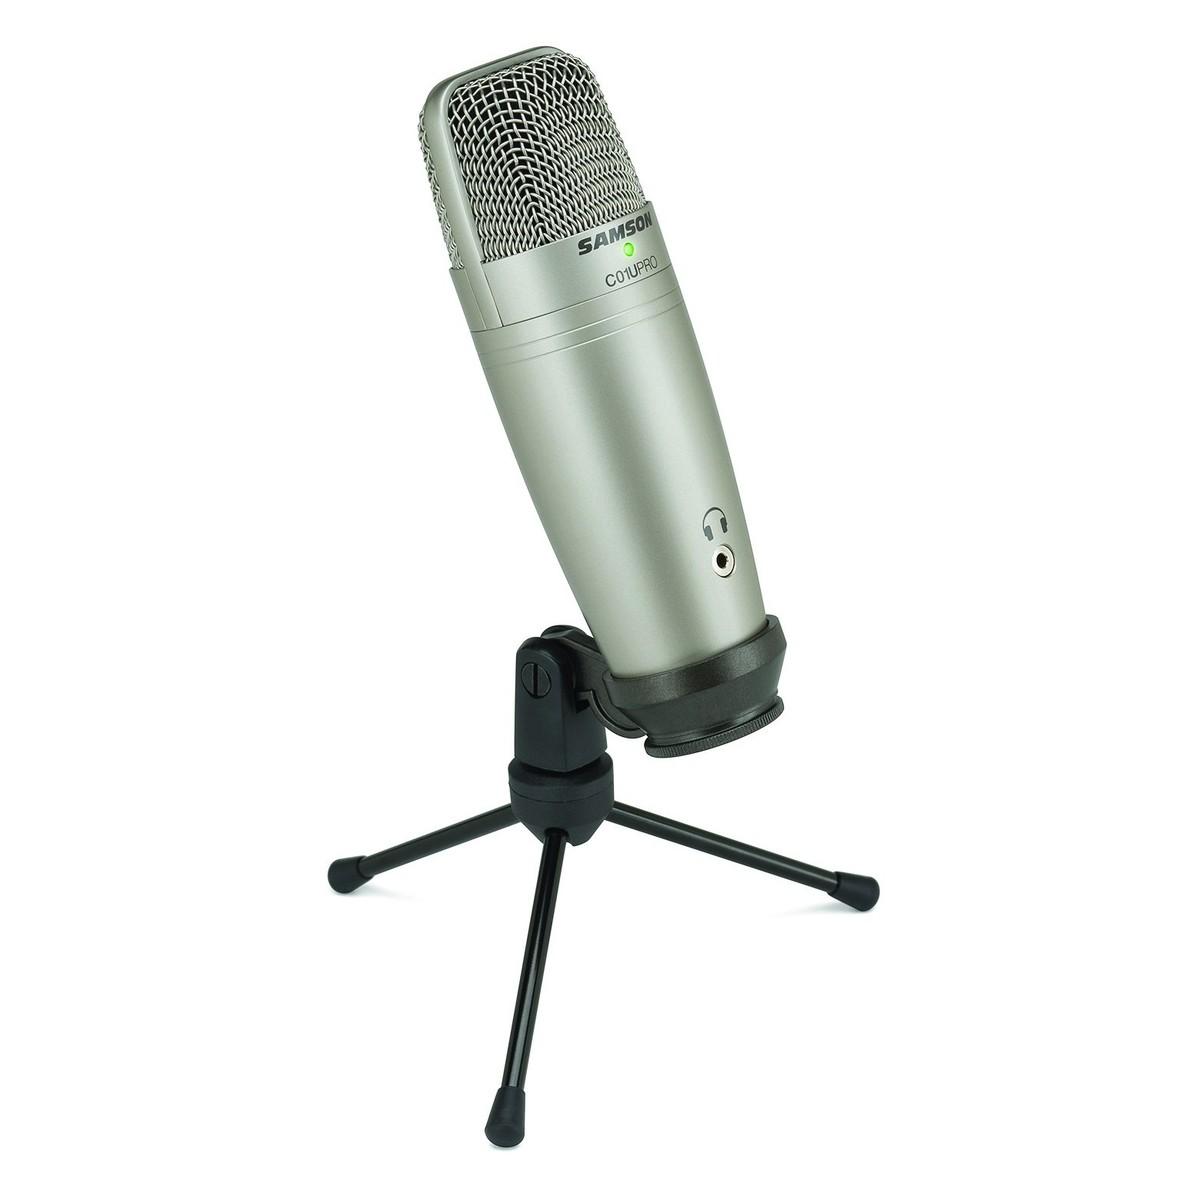 samson c01u pro usb studio condenser microphone at. Black Bedroom Furniture Sets. Home Design Ideas